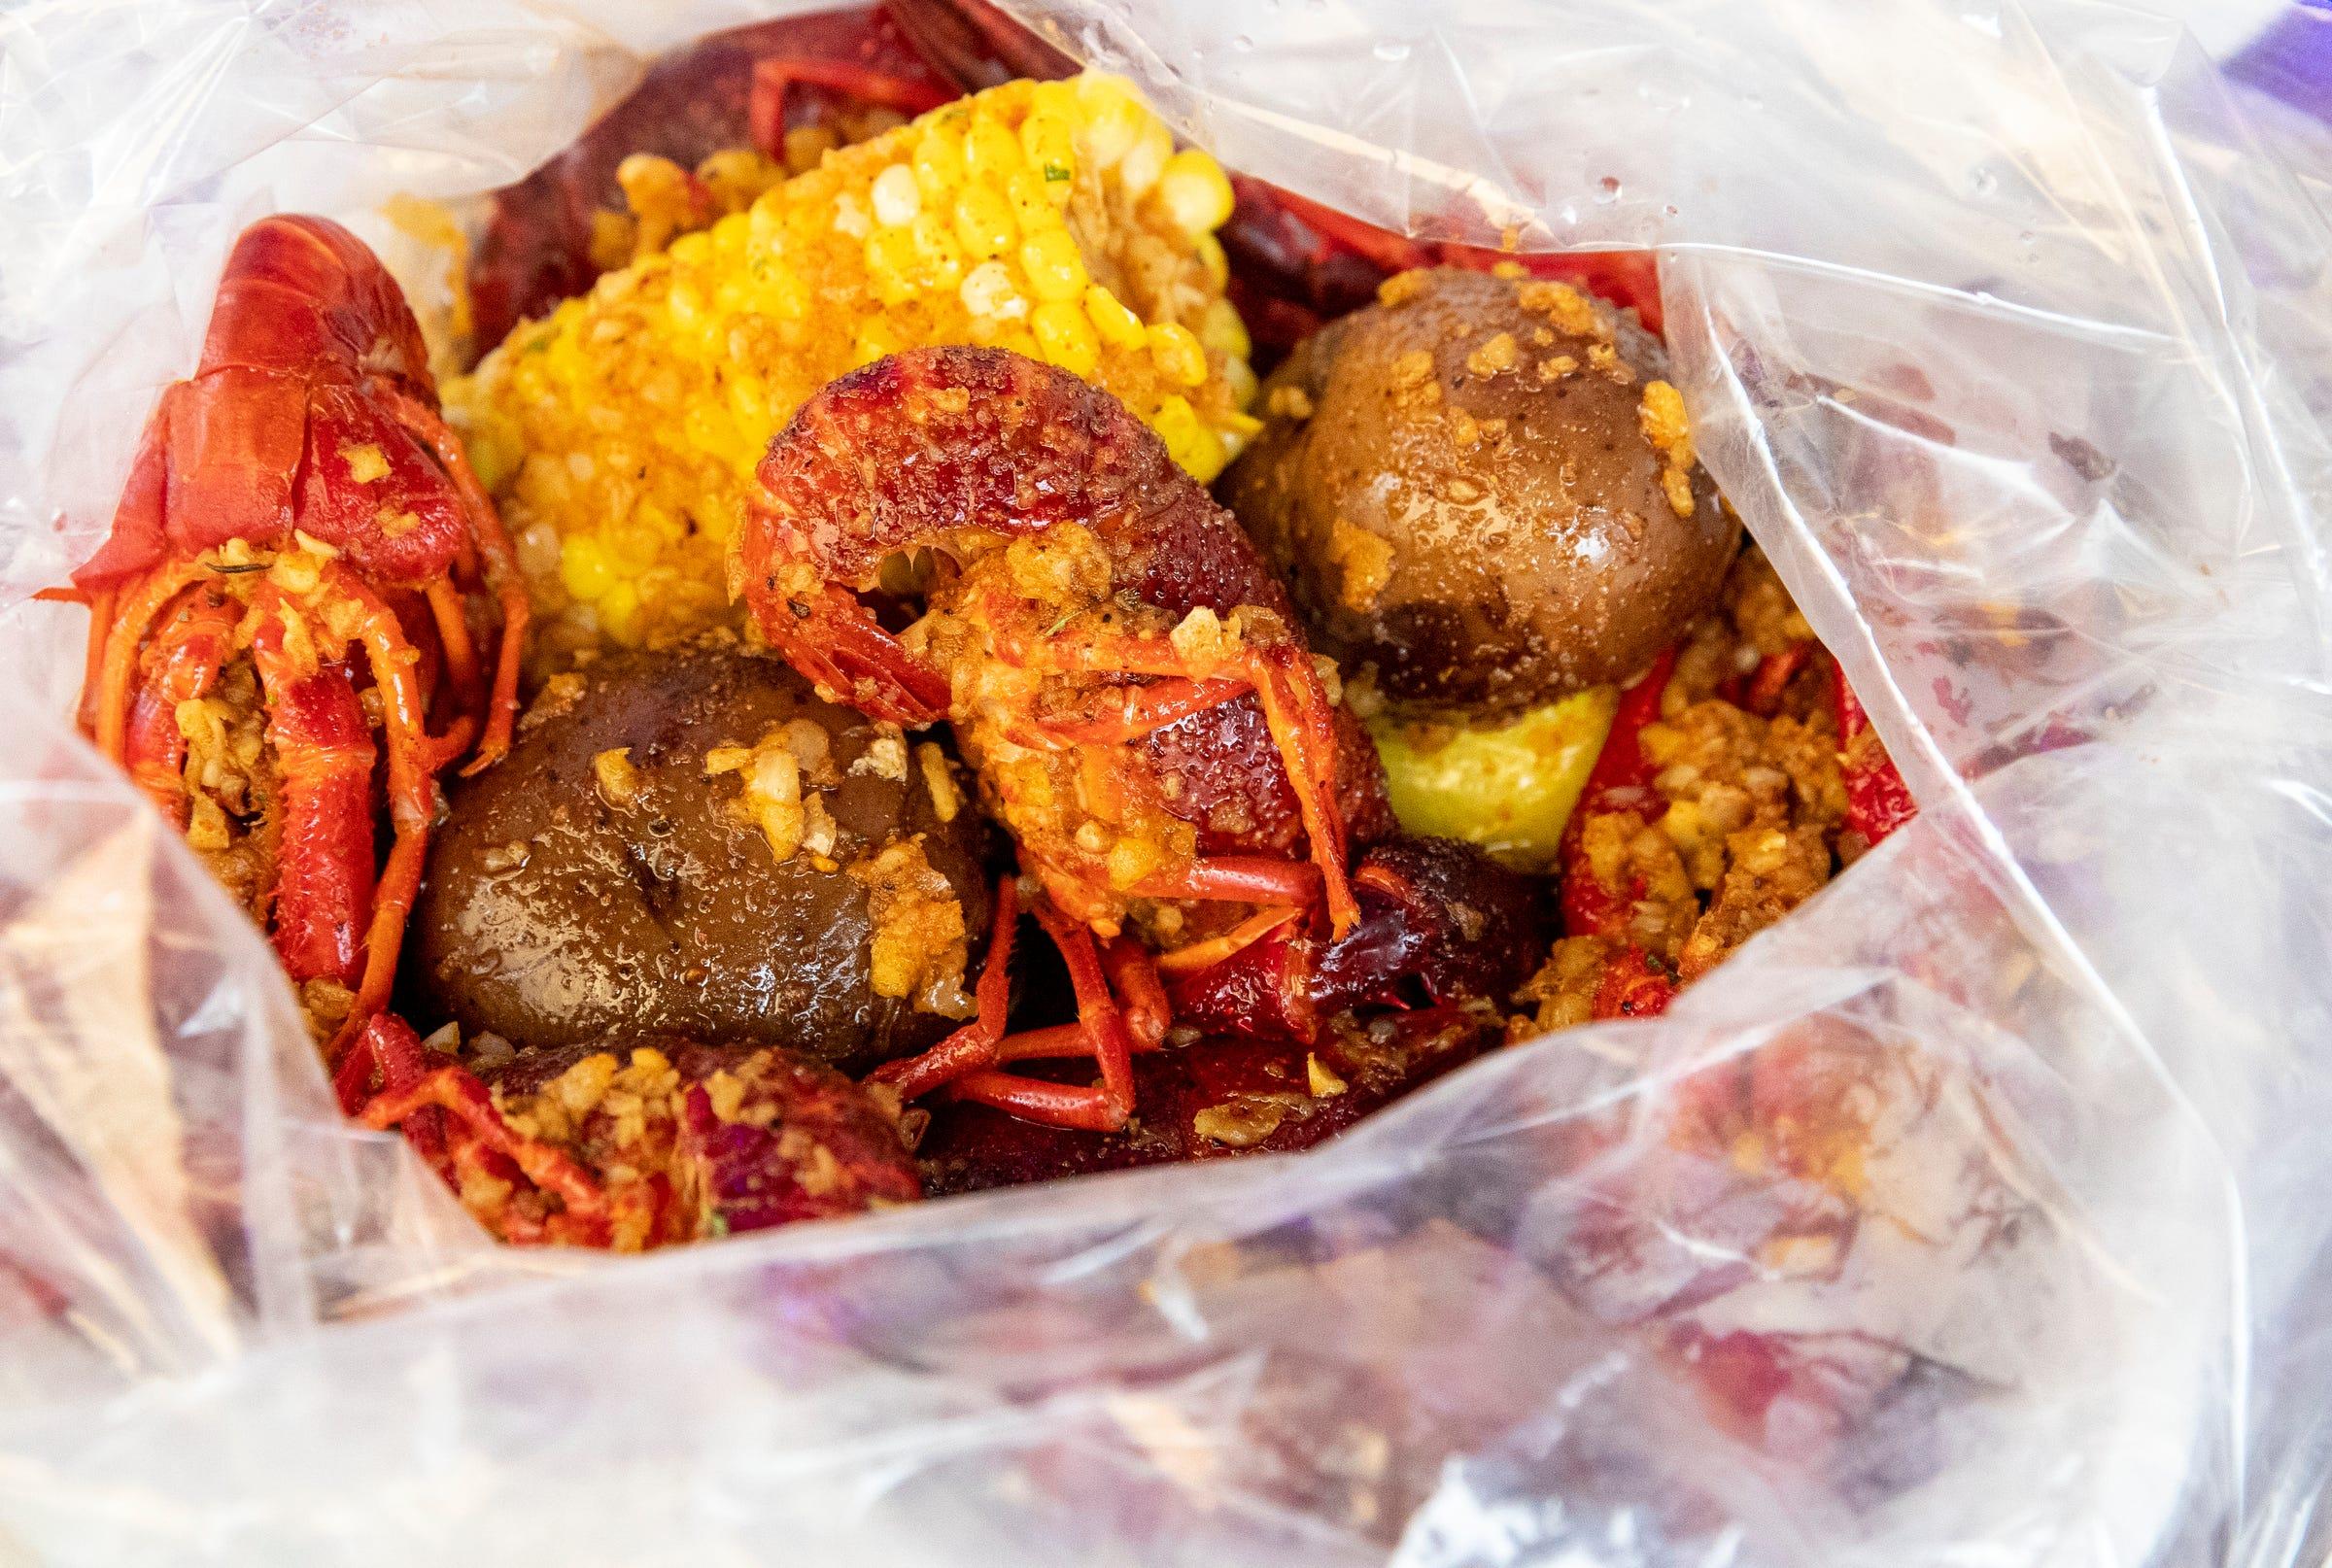 China King In Indianapolis Adds Cajun Food To Menu